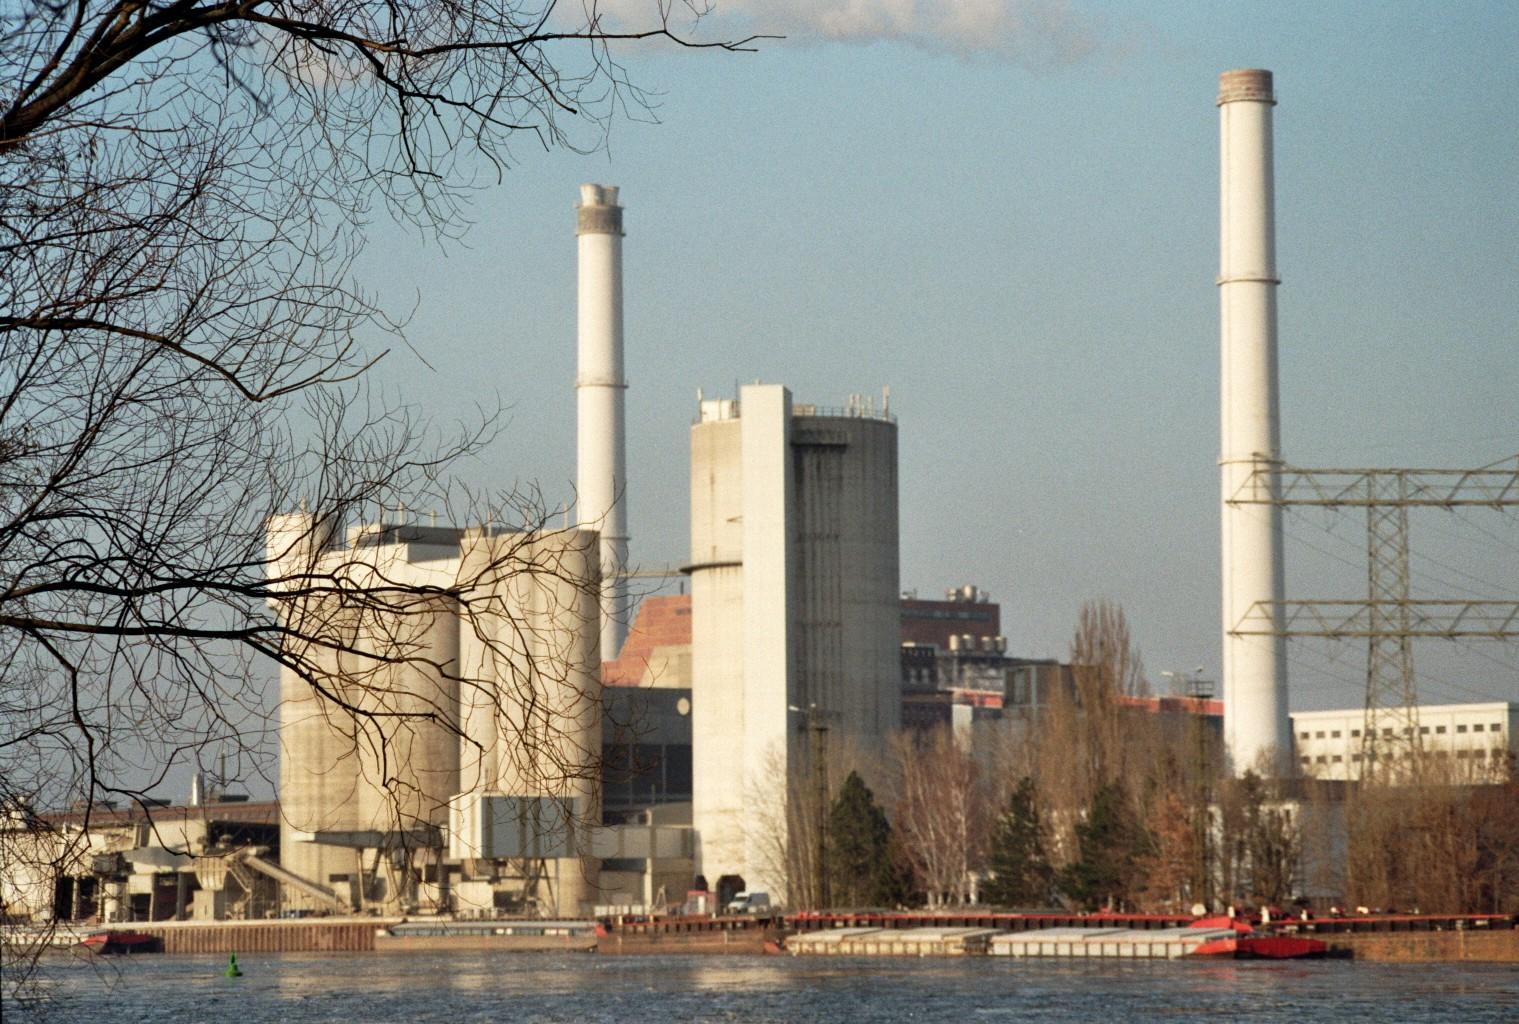 Heizkraftwerk Klingenberg Rummelsburg